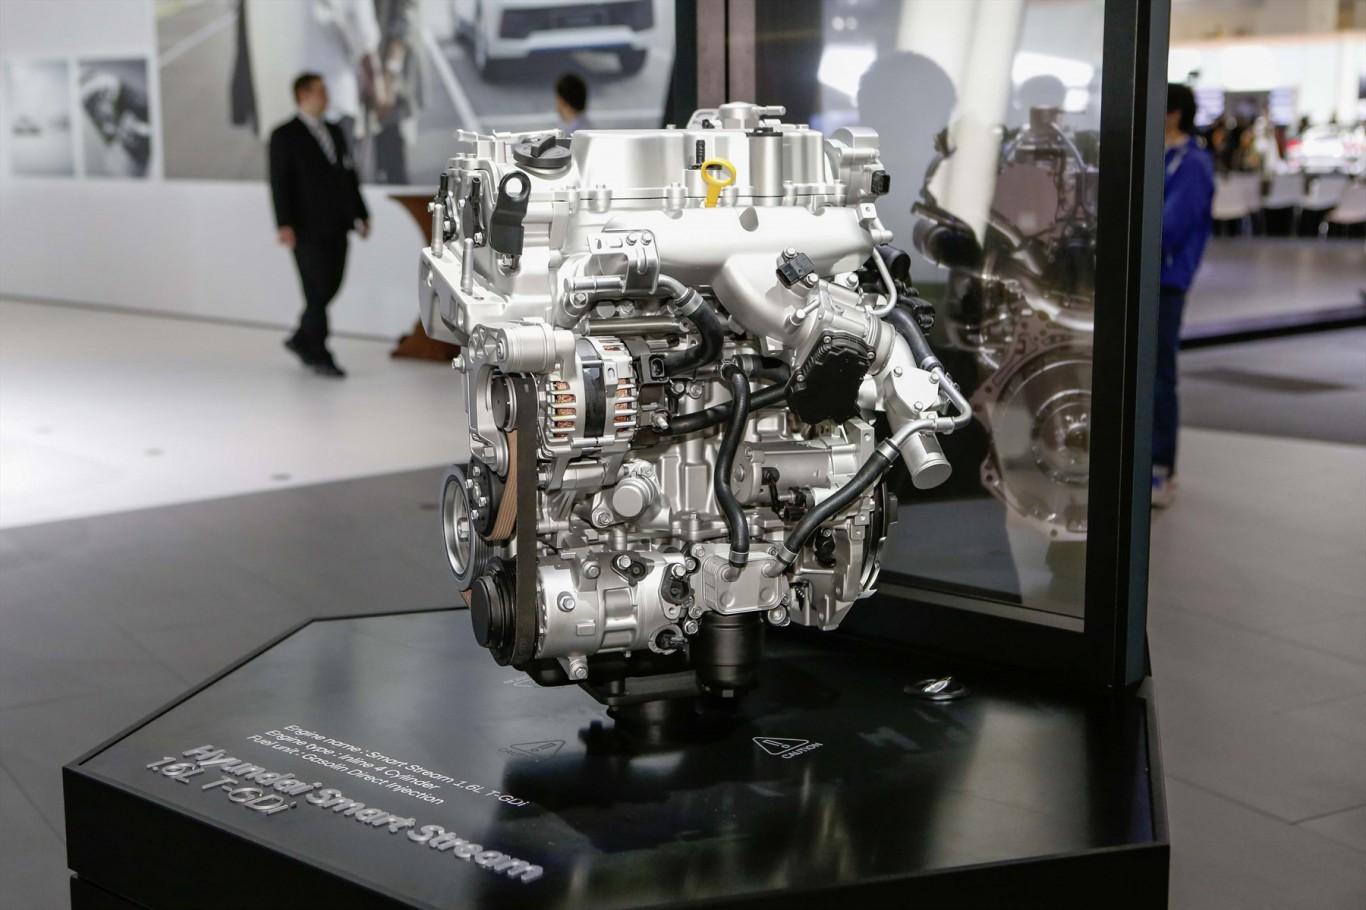 Hyundai reveals 'Smart Stream' engine at Frankfurt Motor Show